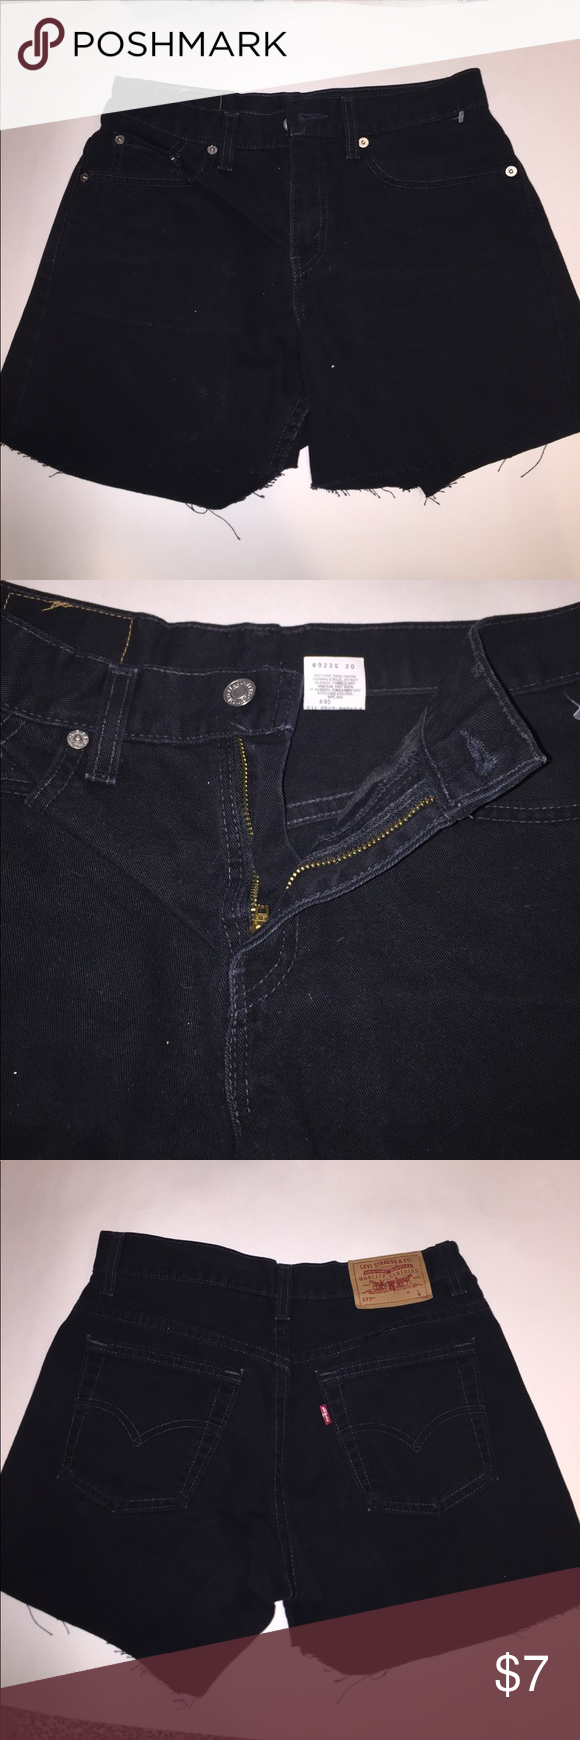 Levi's Black Jean Shorts Levi's Black Jean Shorts, originally women's pants- CUT INTO DIY SHORTS, size 4, never worn Levi's Shorts Jean Shorts